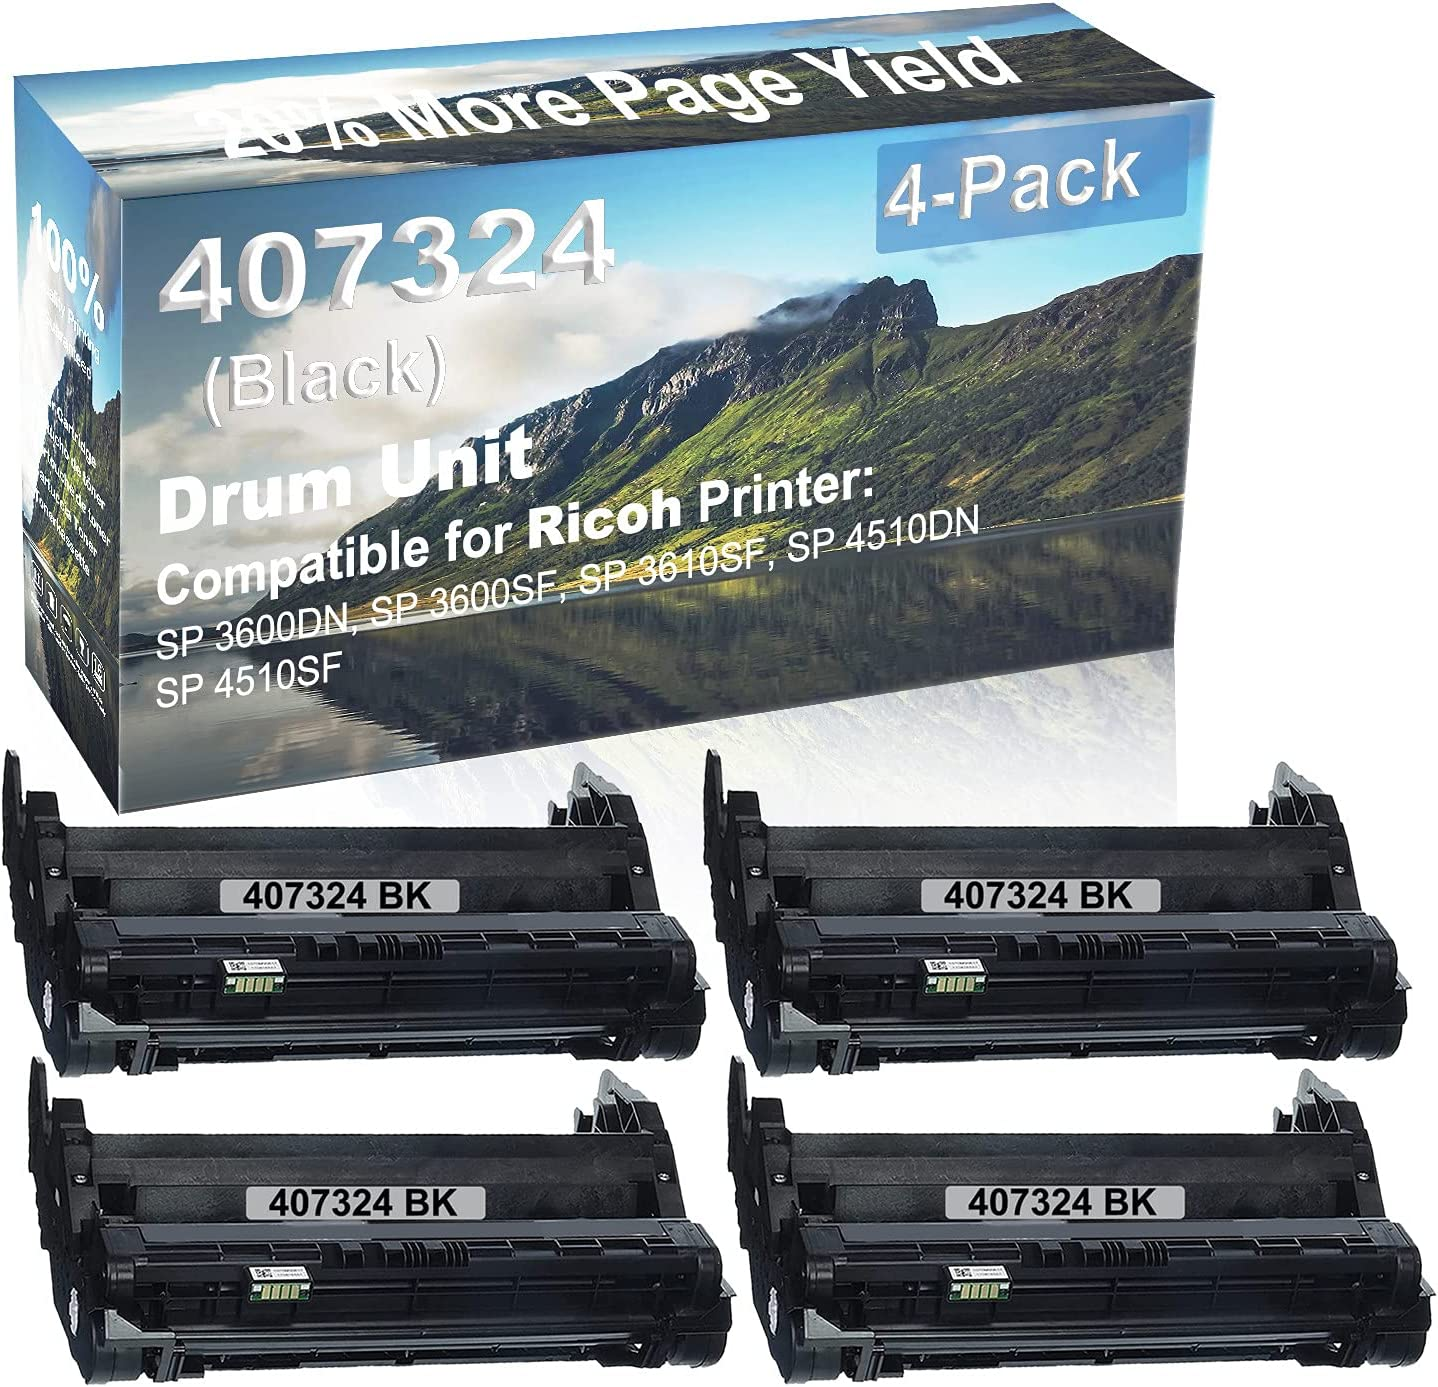 4-Pack Compatible Drum Unit (Black) Replacement for Ricoh 407324 Drum Kit use for Ricoh SP 3600DN, SP 3600SF, SP 3610SF, SP 4510DN, SP 4510SF Printer